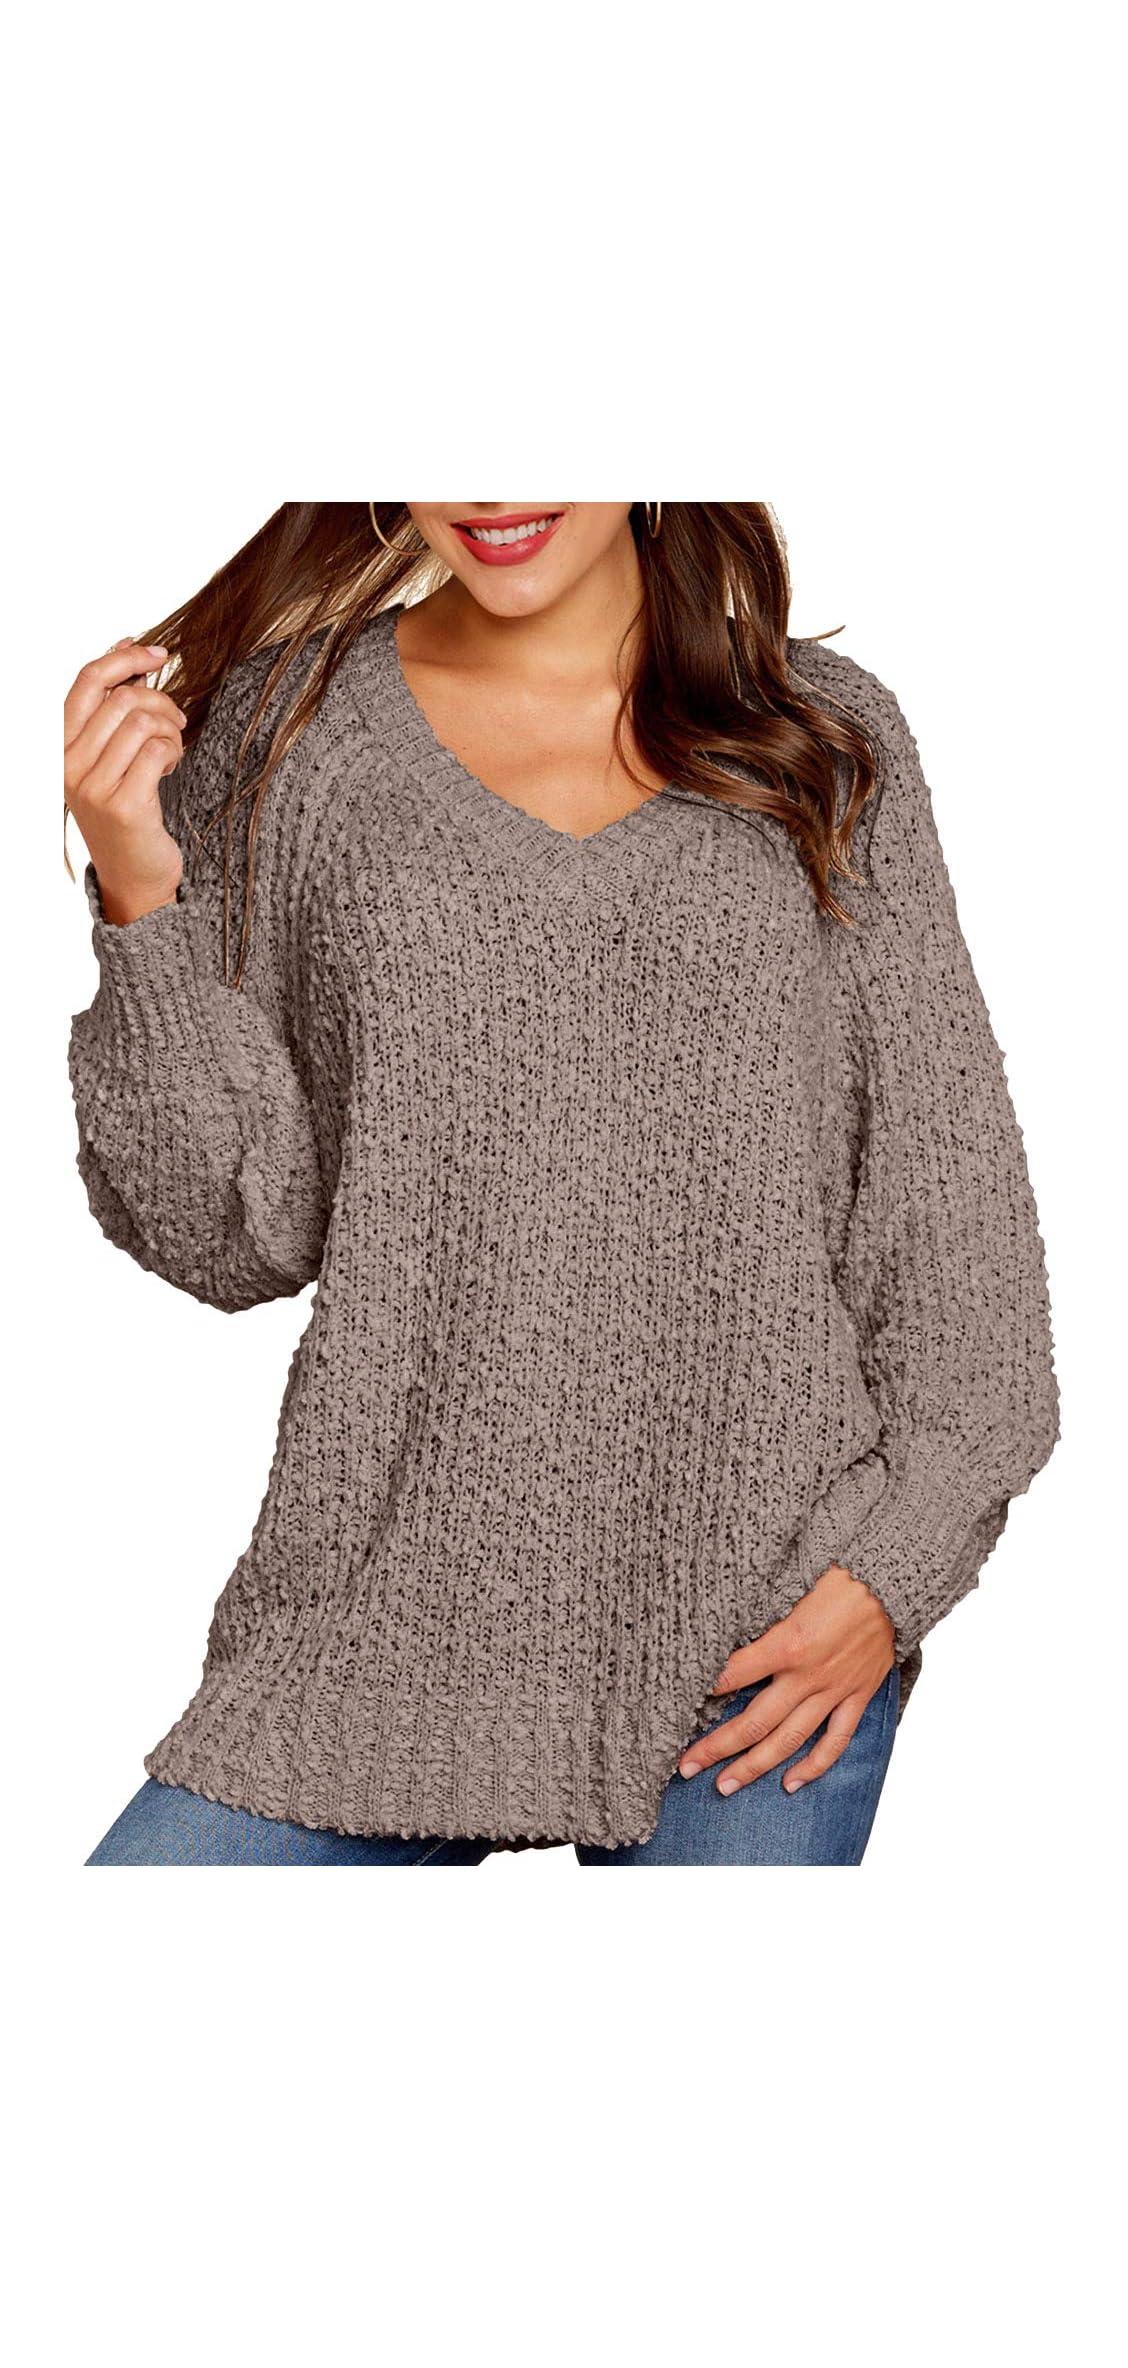 Womens Winter Fuzzy Popcorn Sweater V Neck Long Sleeves